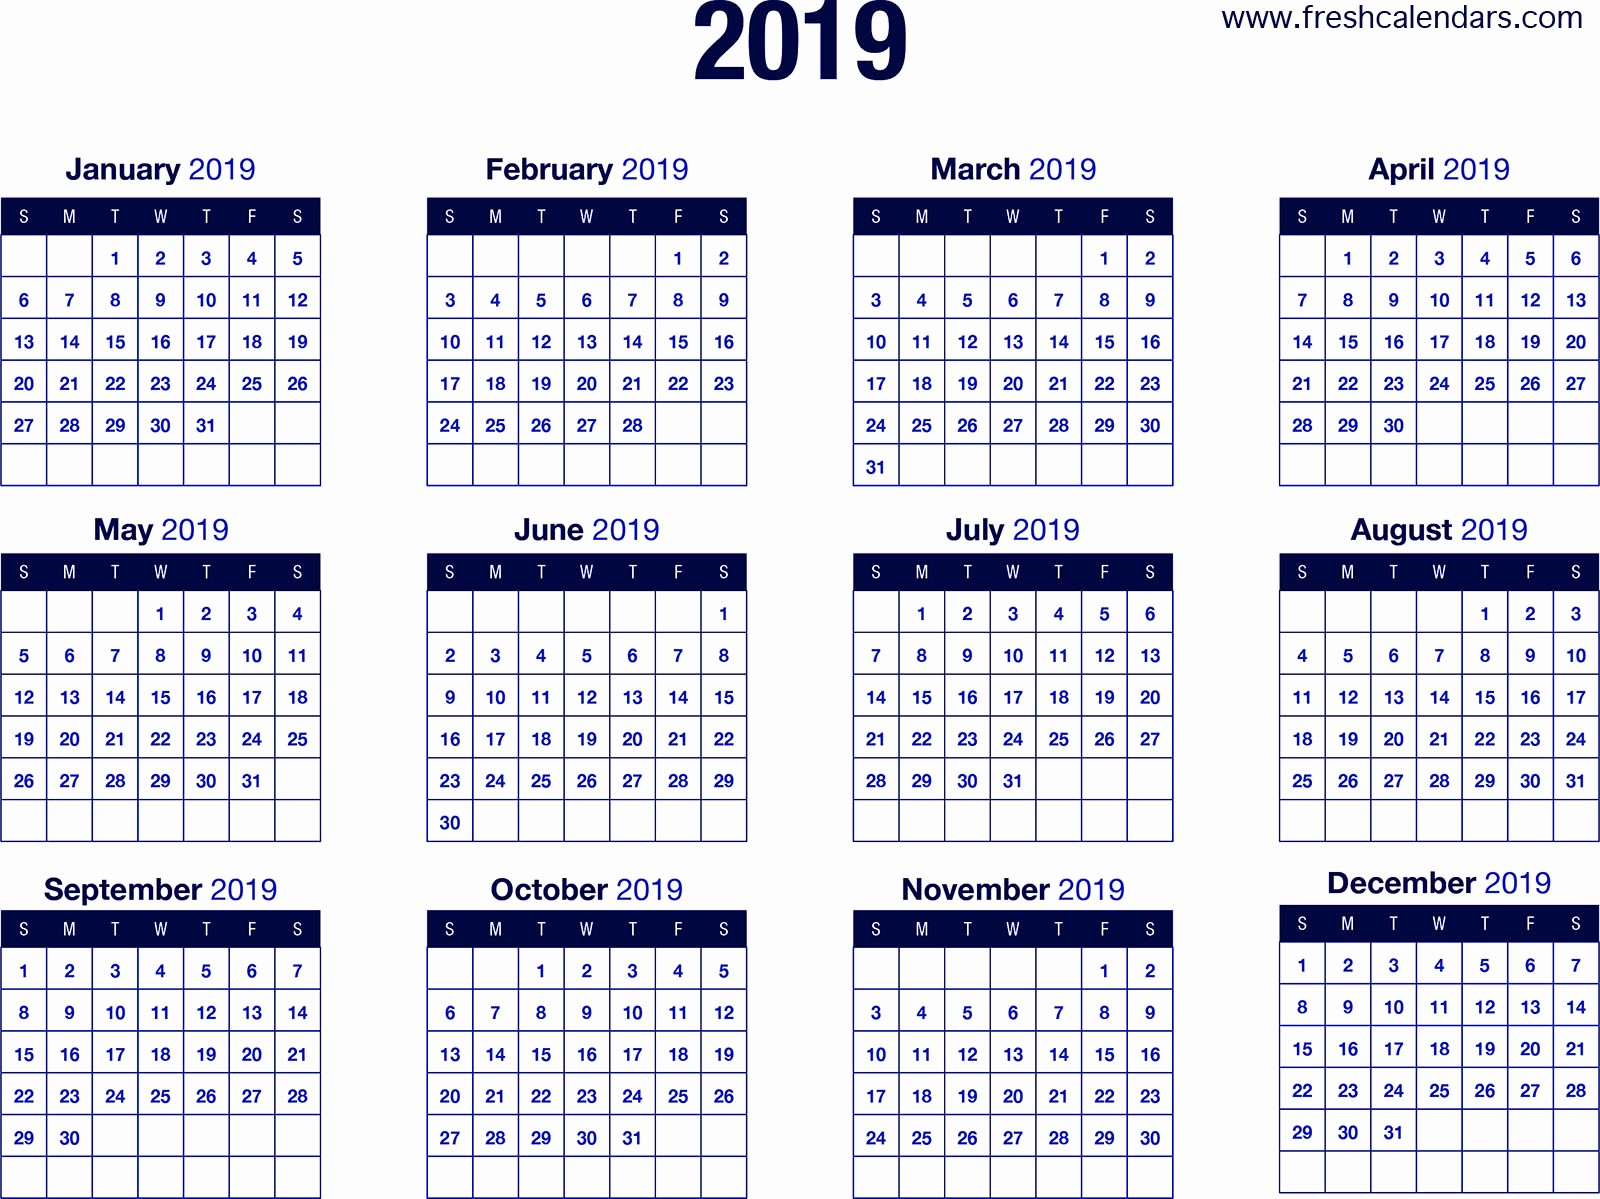 Free Printable 2019 Yearly Calendar Beautiful 2019 Calendar